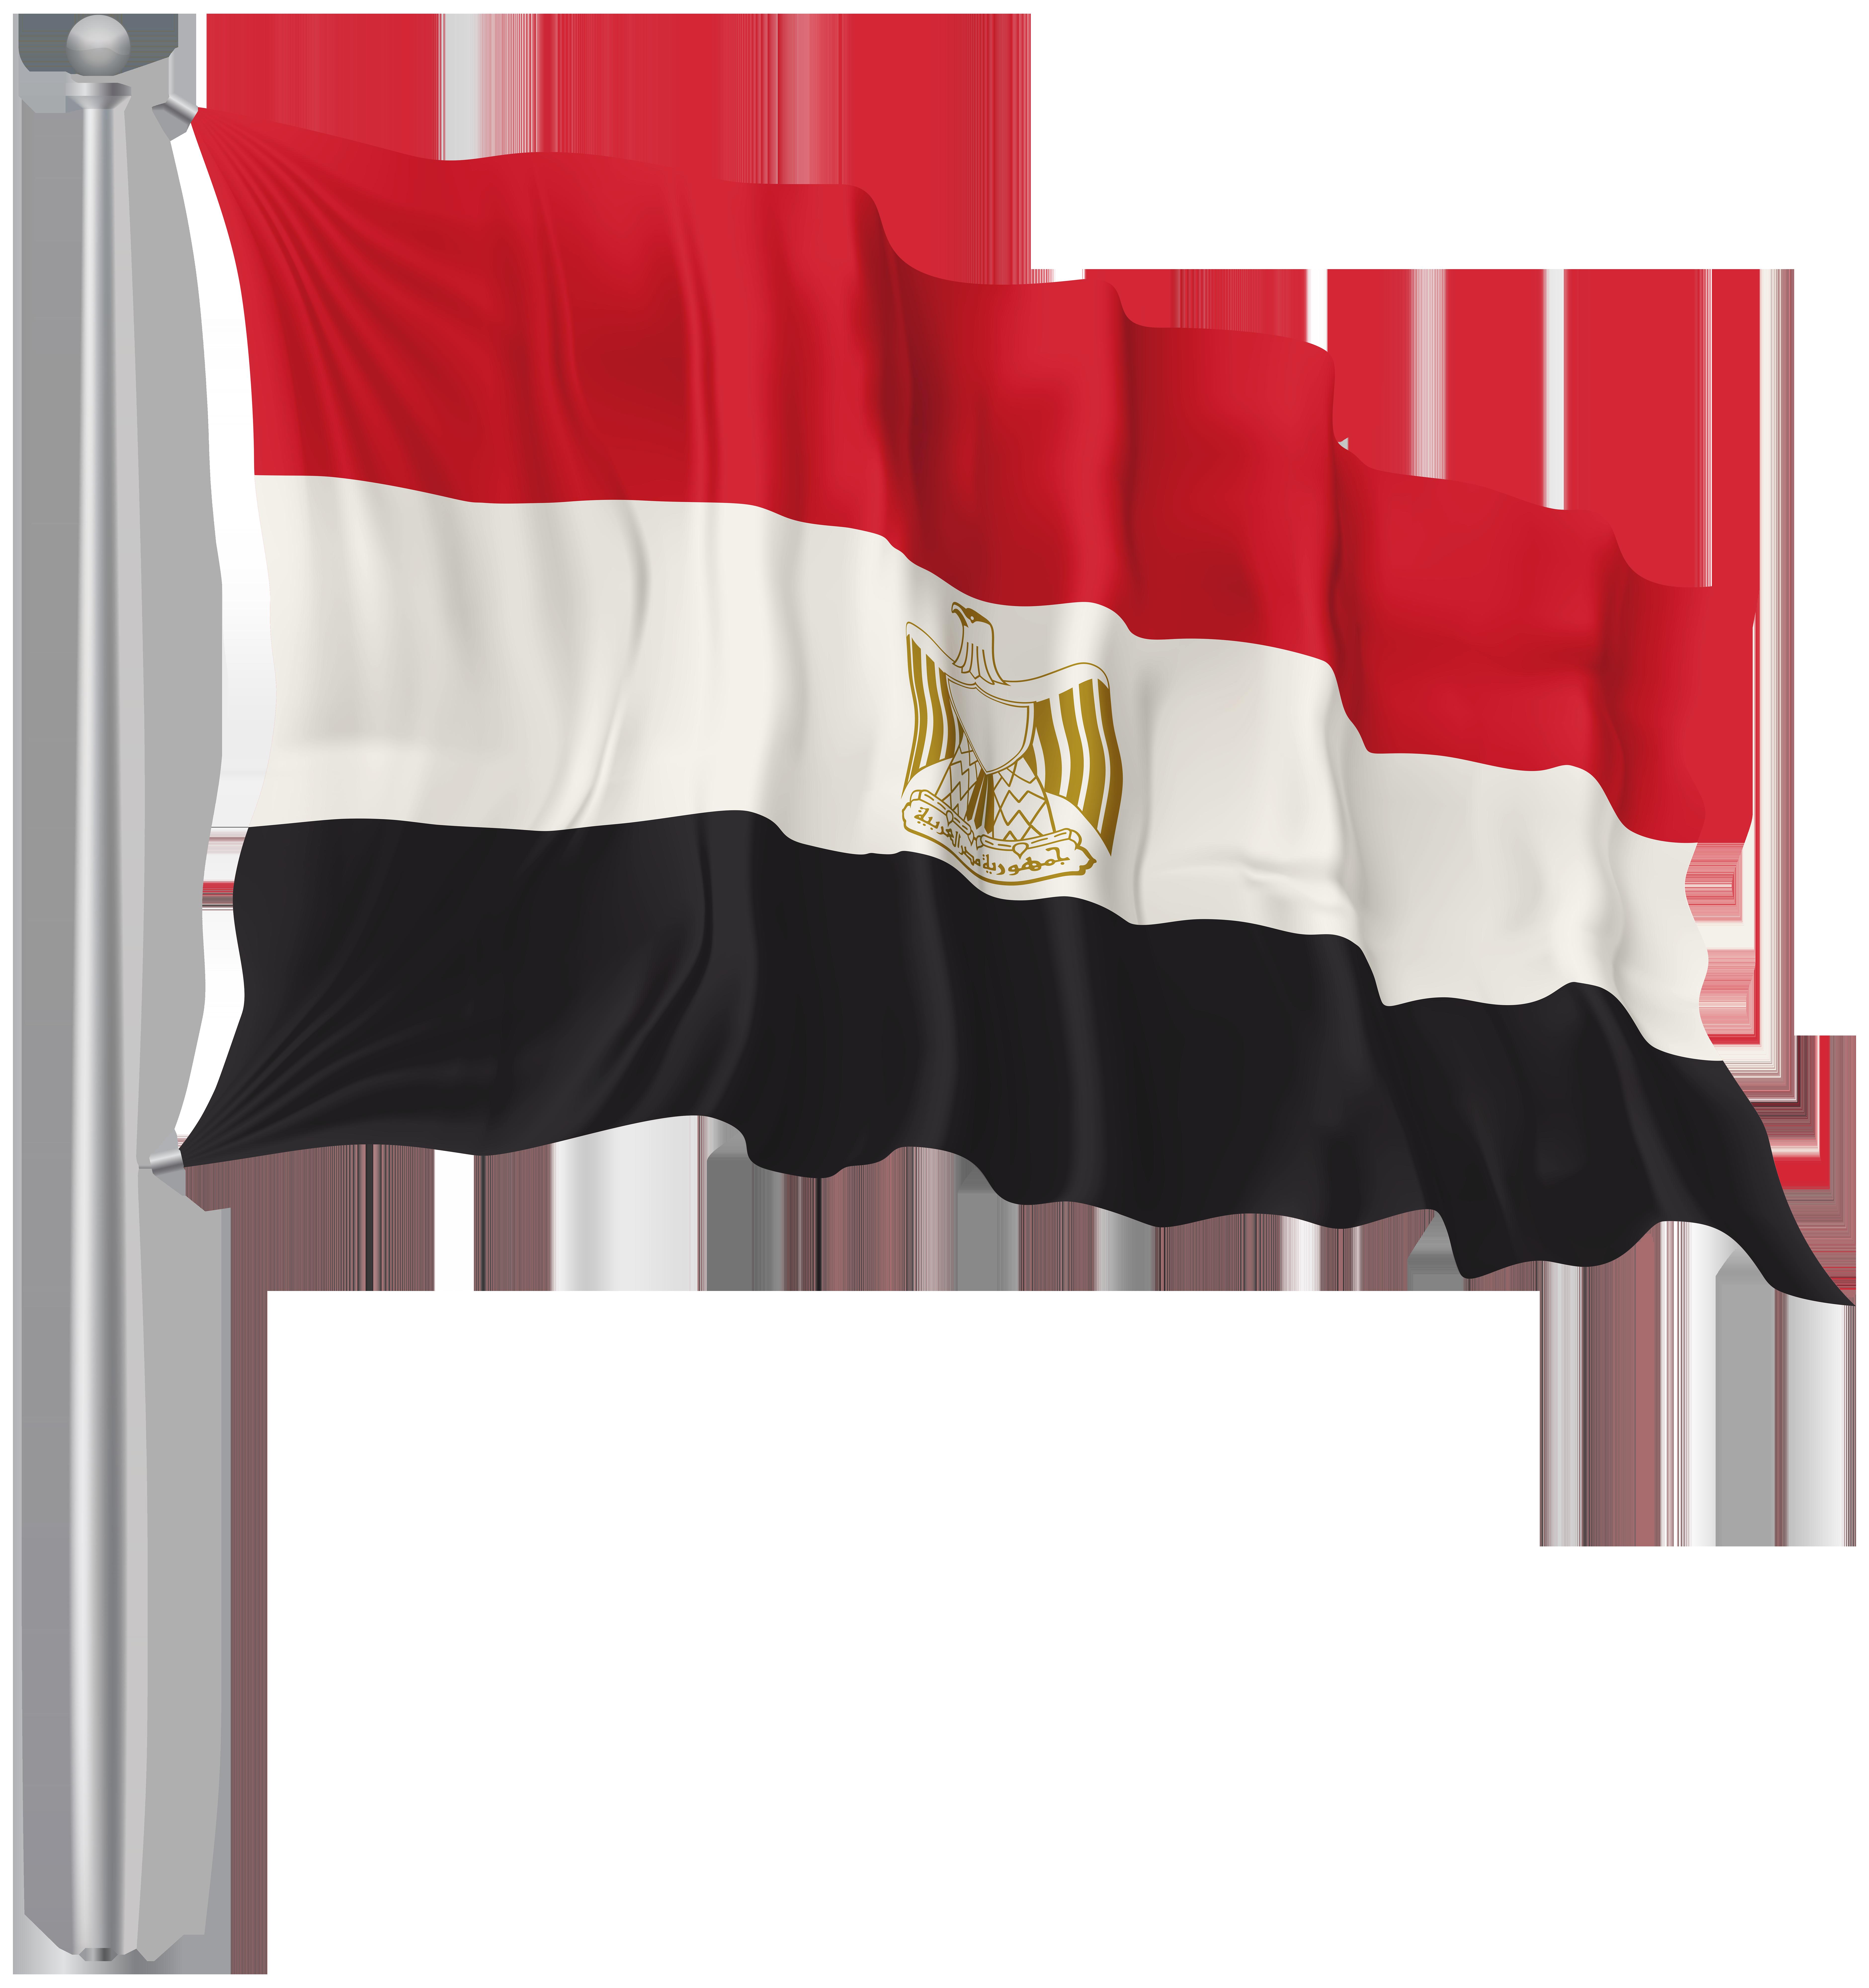 Egypt waving flag png. Egyptian clipart egyptian background